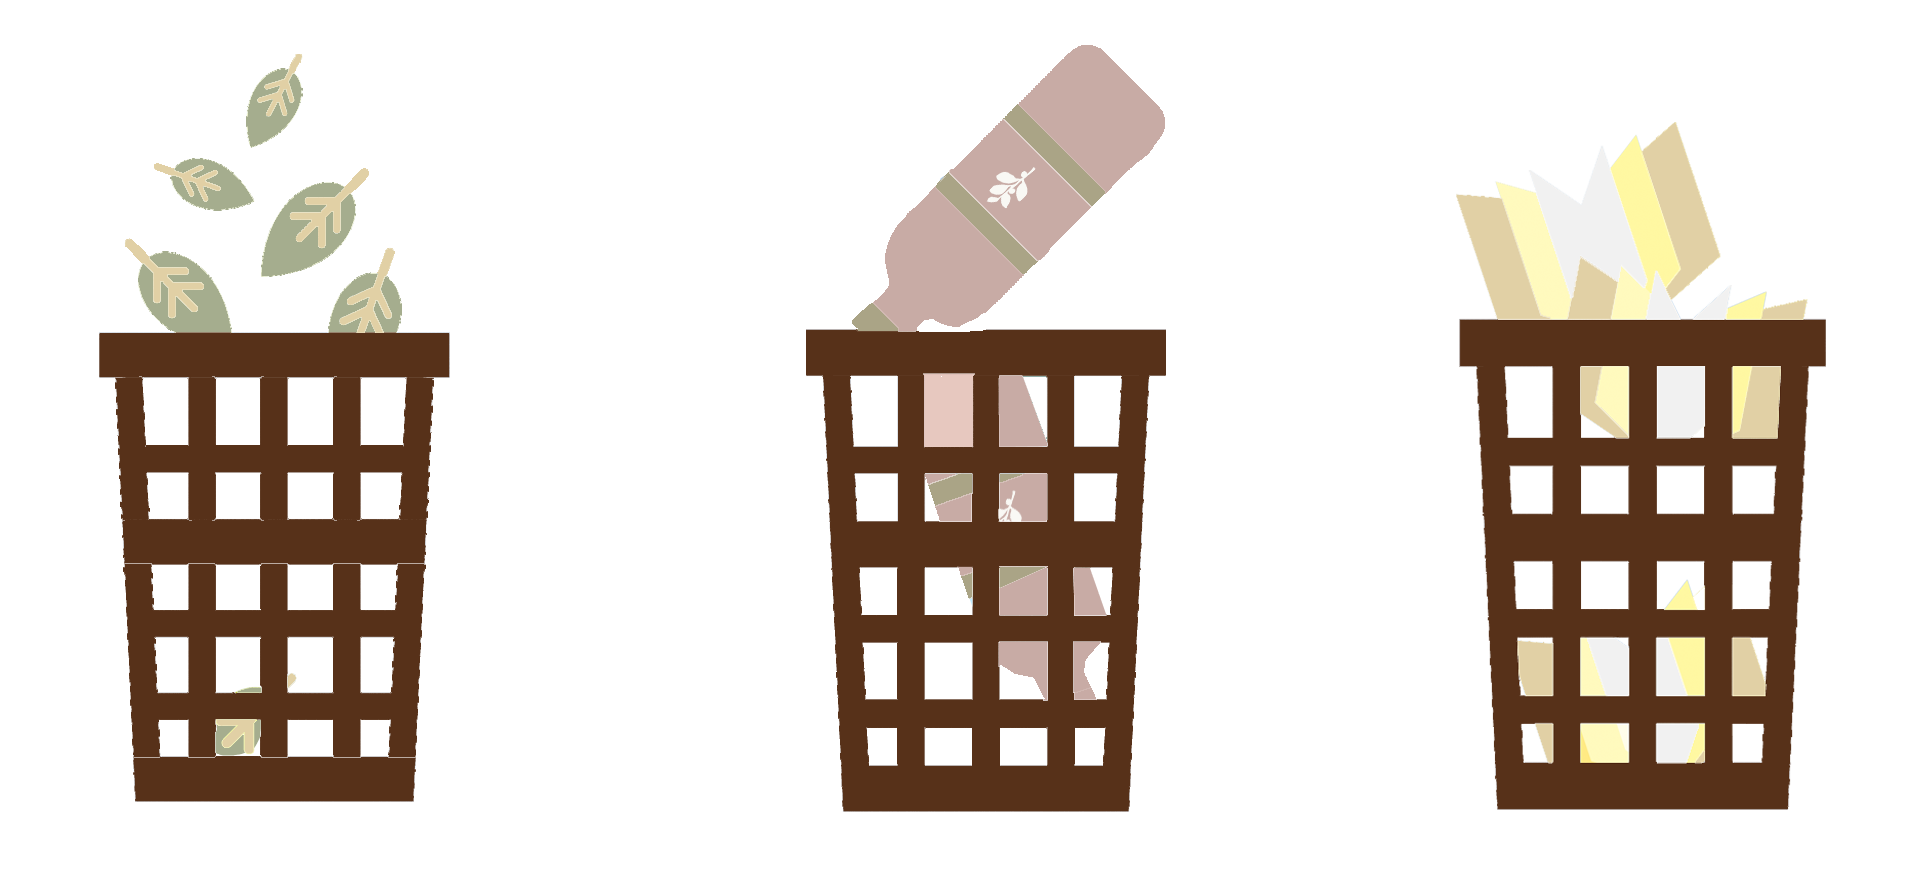 Trash bins with sorted rubbish drawings